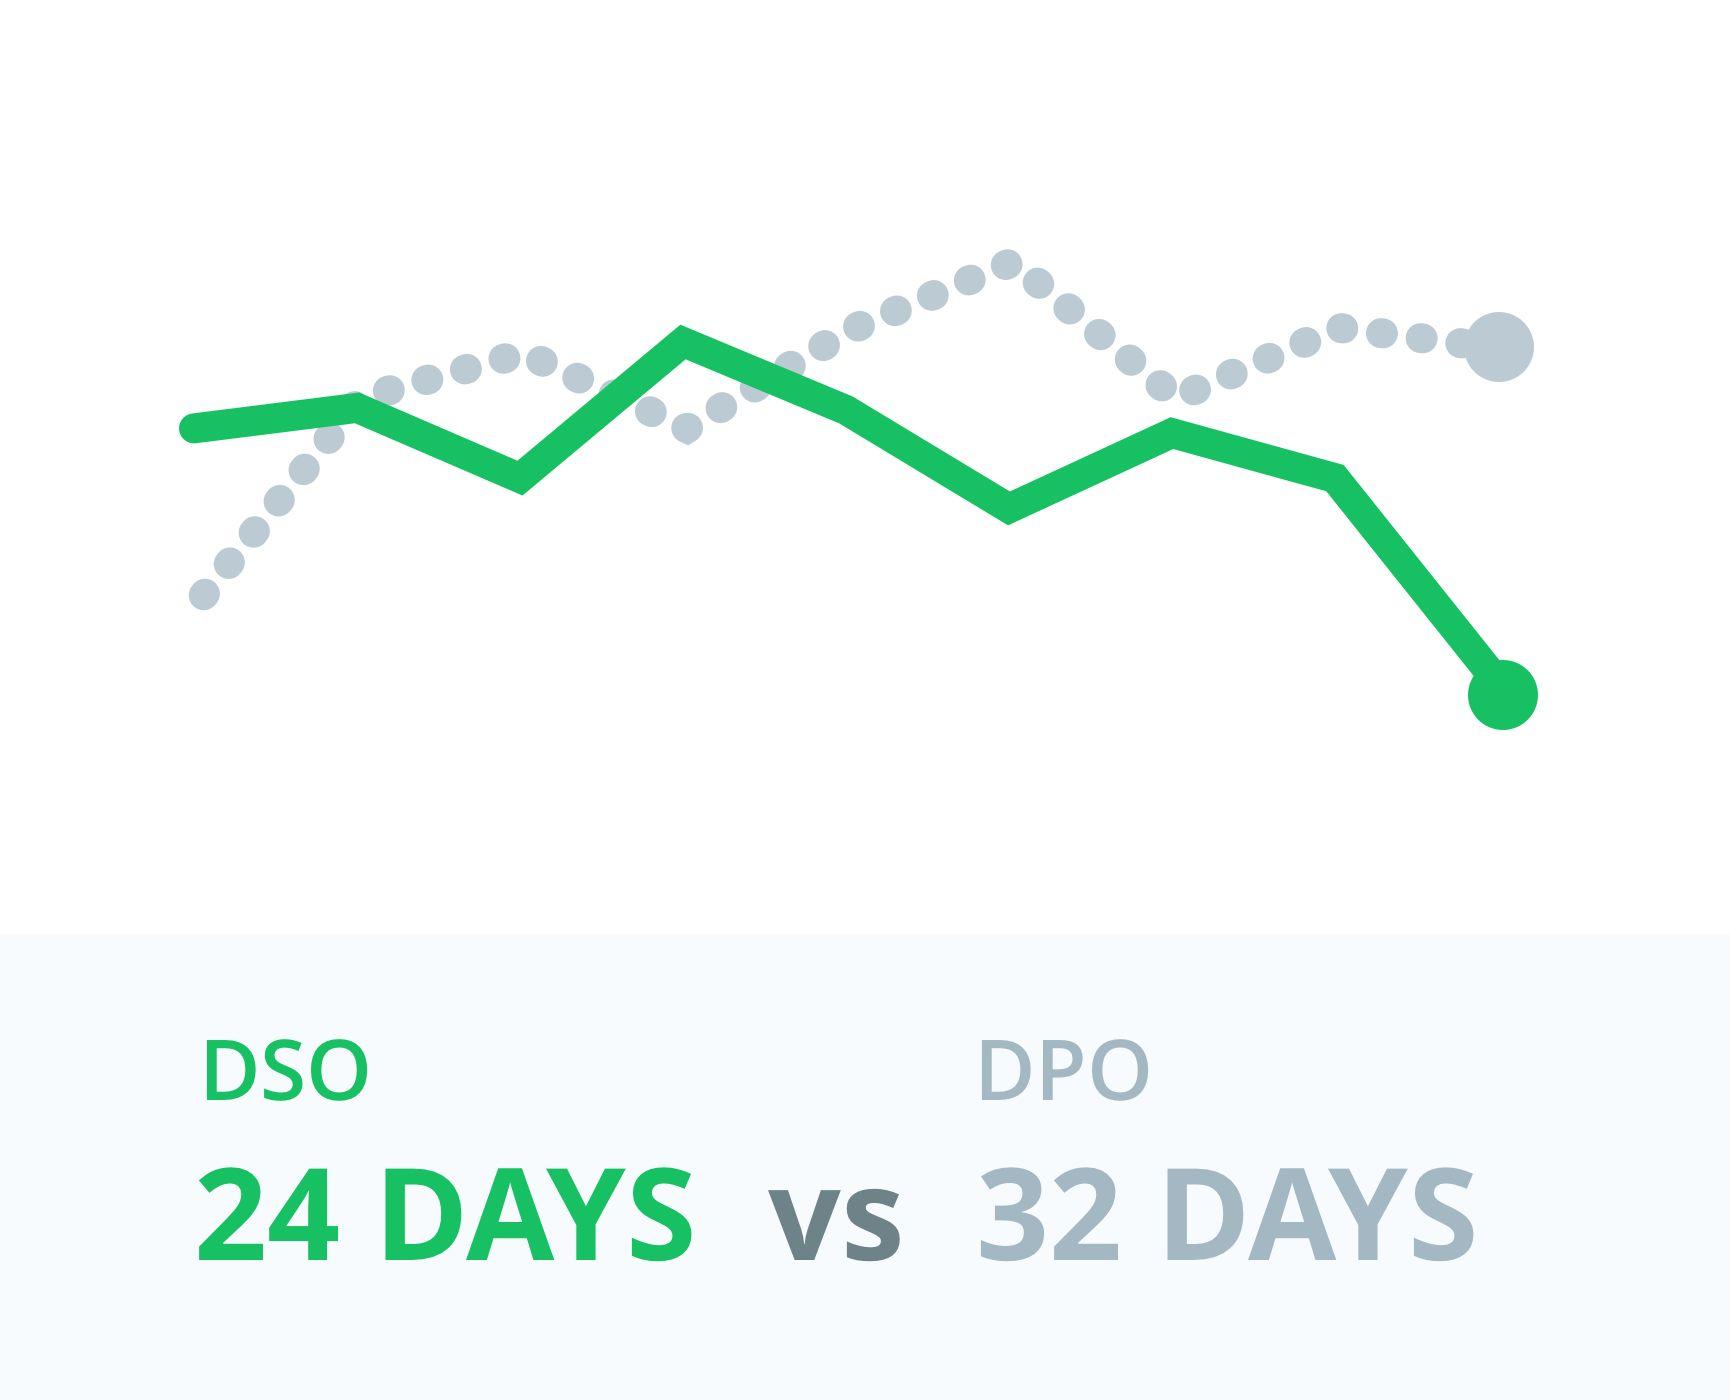 Days Payables vs Days Sales Outstanding - Balance Sheet Metrics